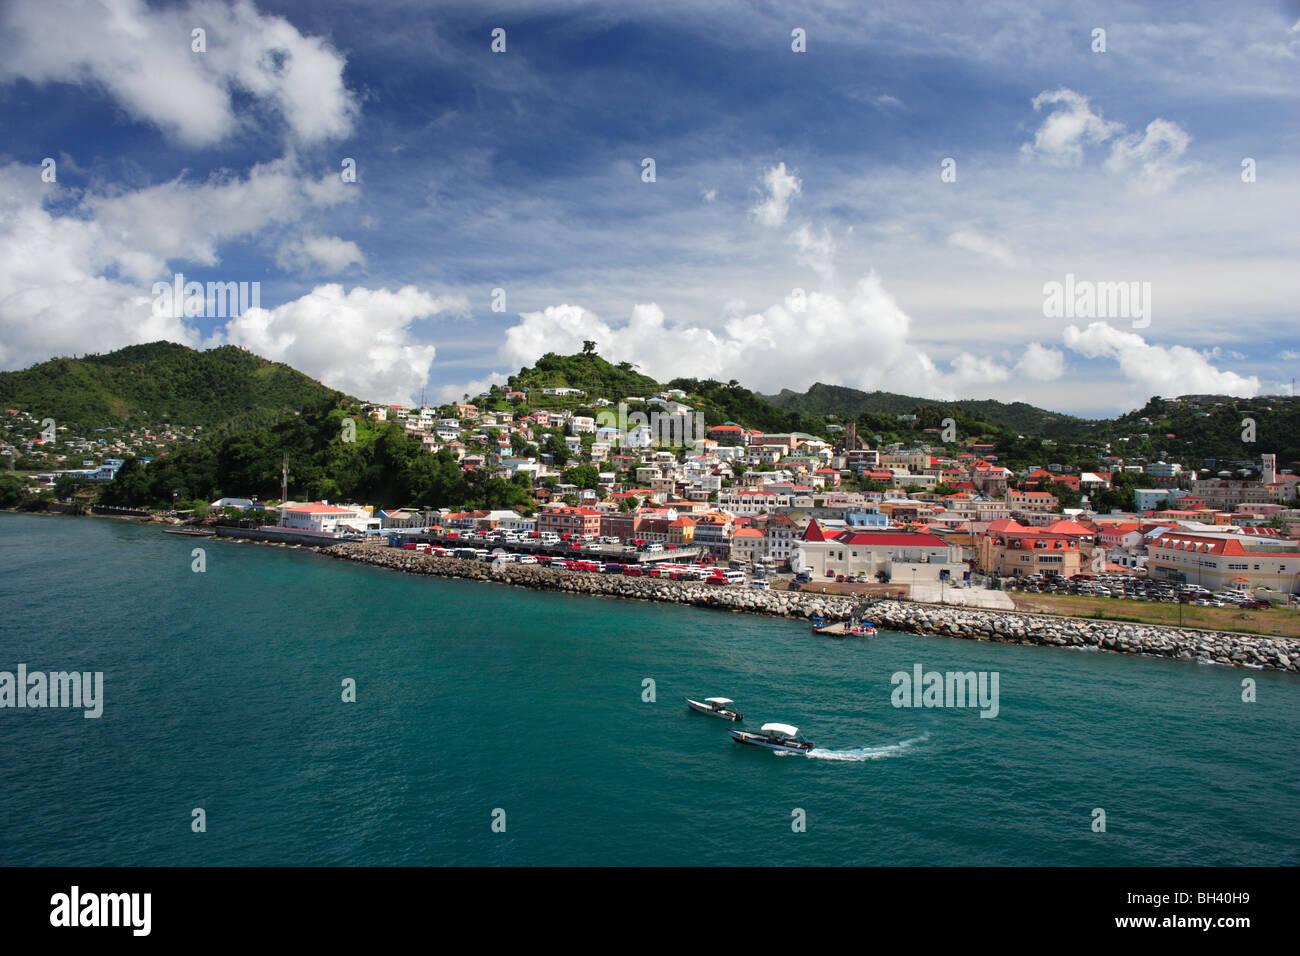 St George's, Grenade, Caraïbes Banque D'Images